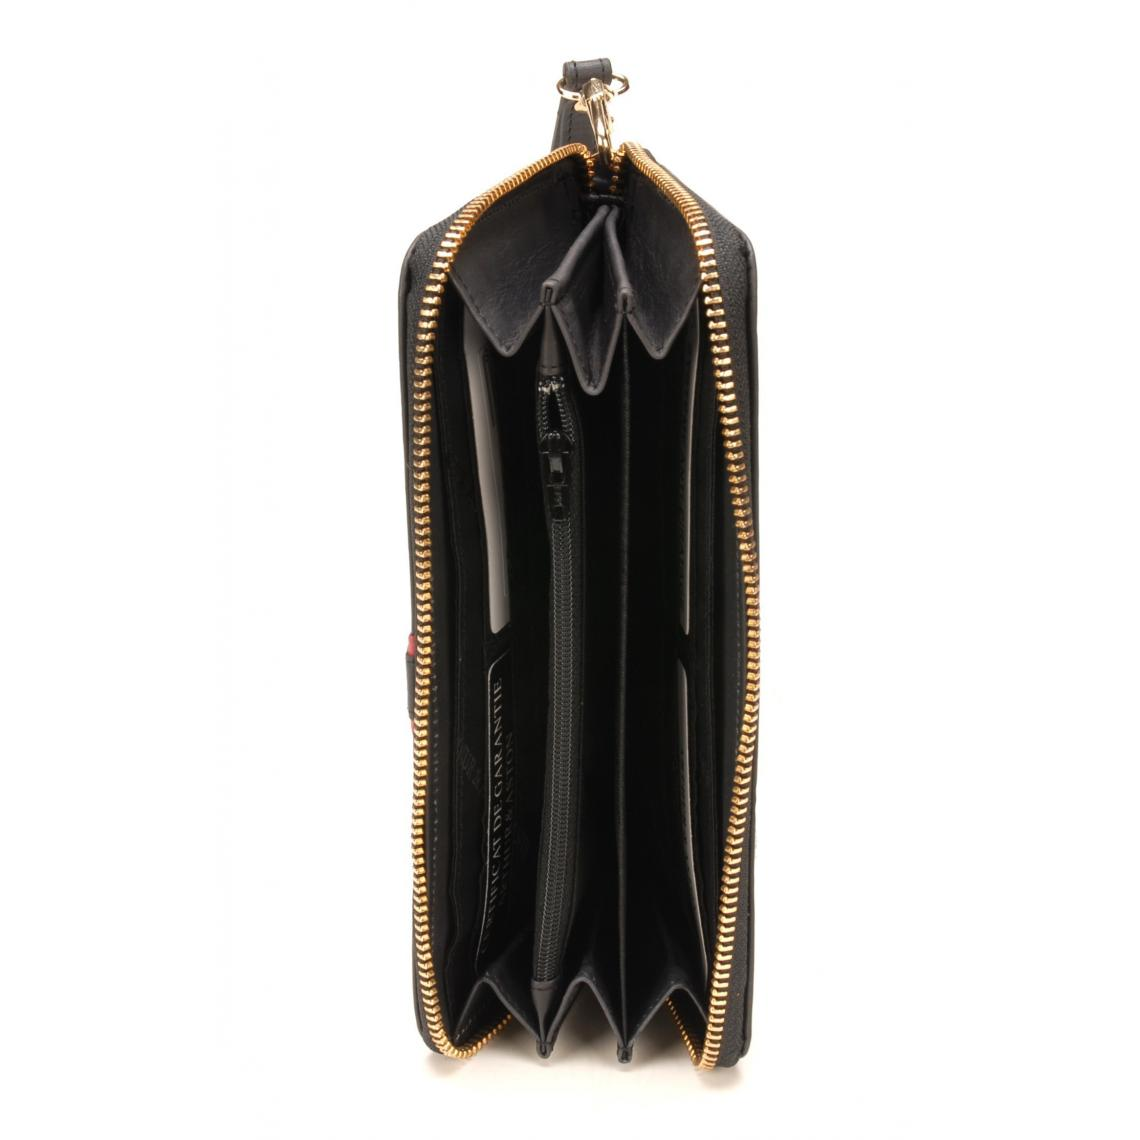 Compagnon zippé - cuir vachette hIFeD